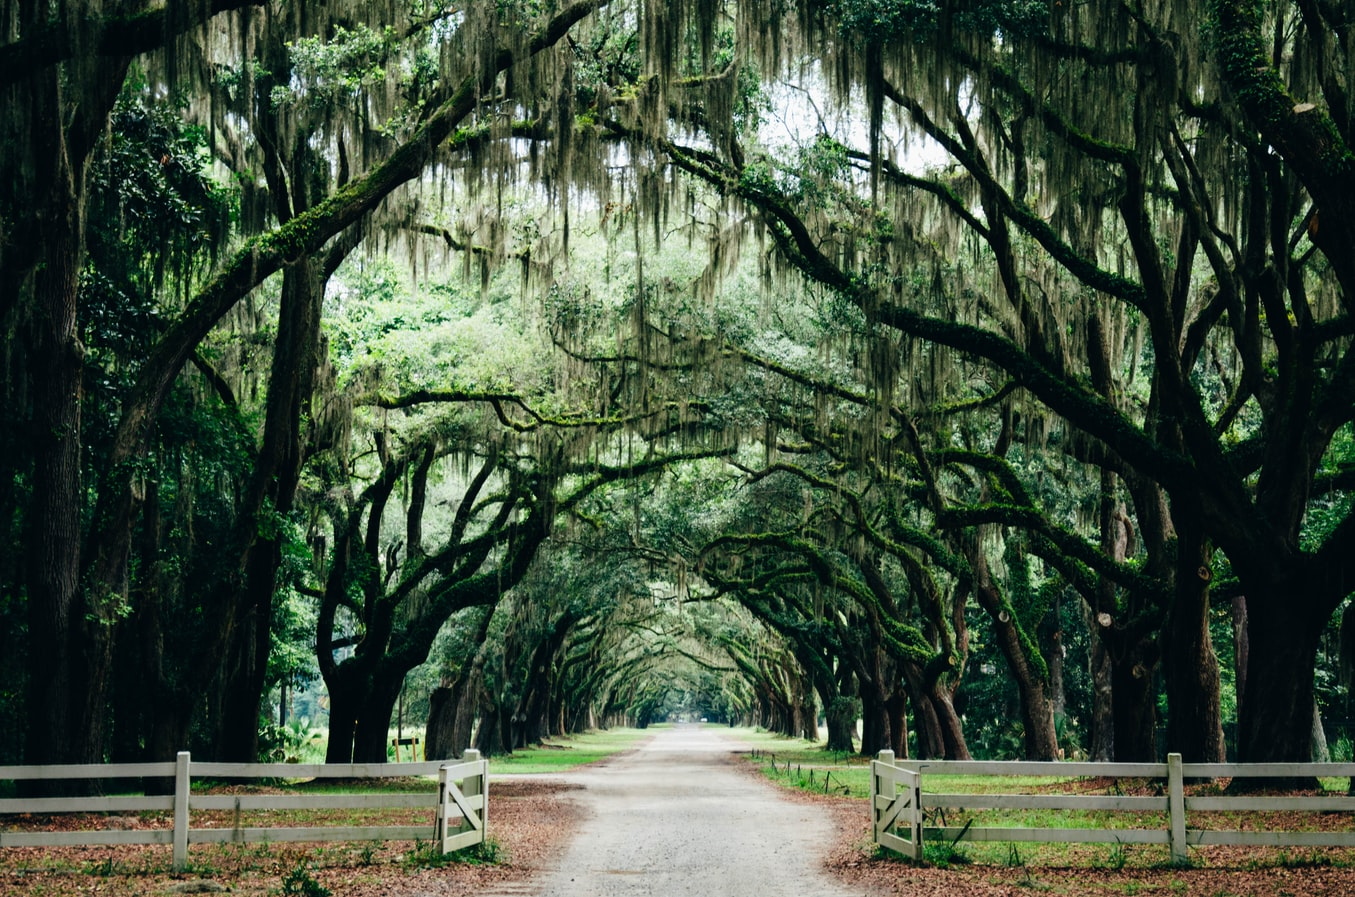 tall trees lean over a pathway in Savannah, Georgia